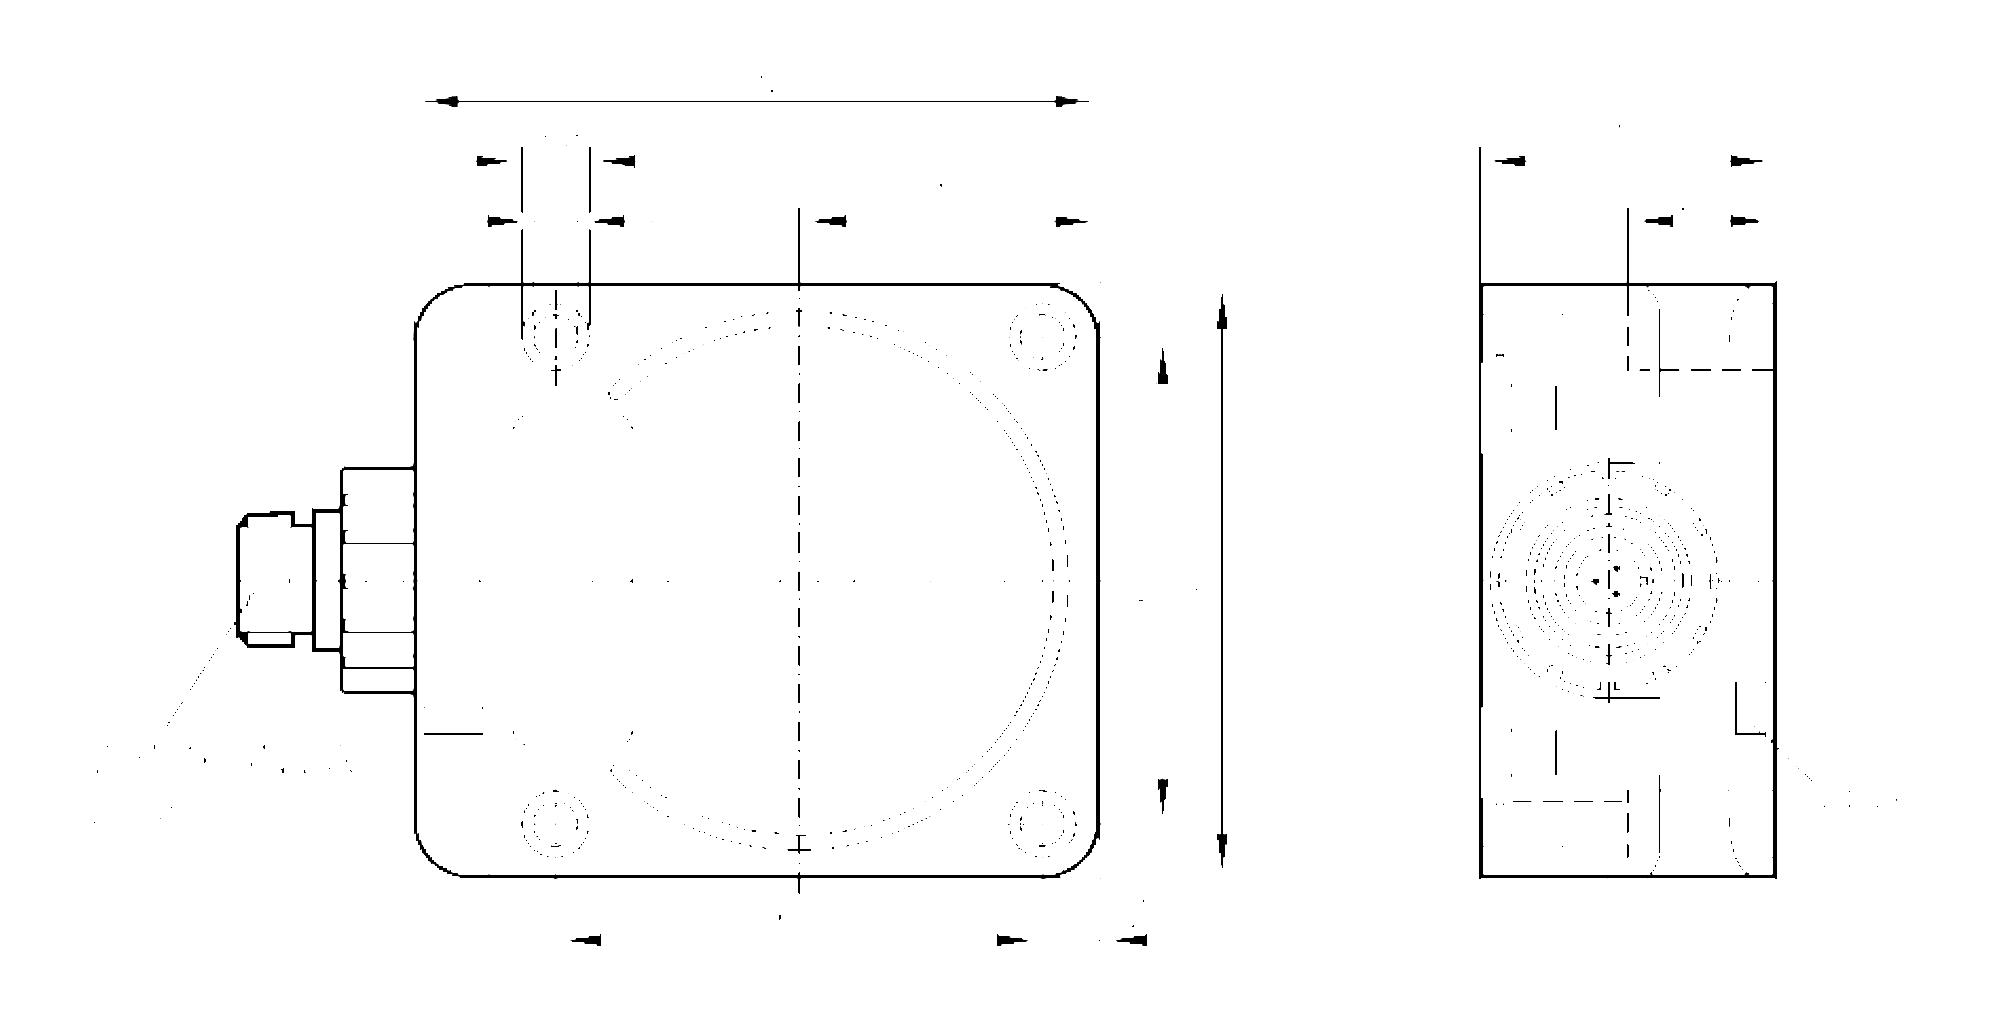 id0038 - inductive sensor